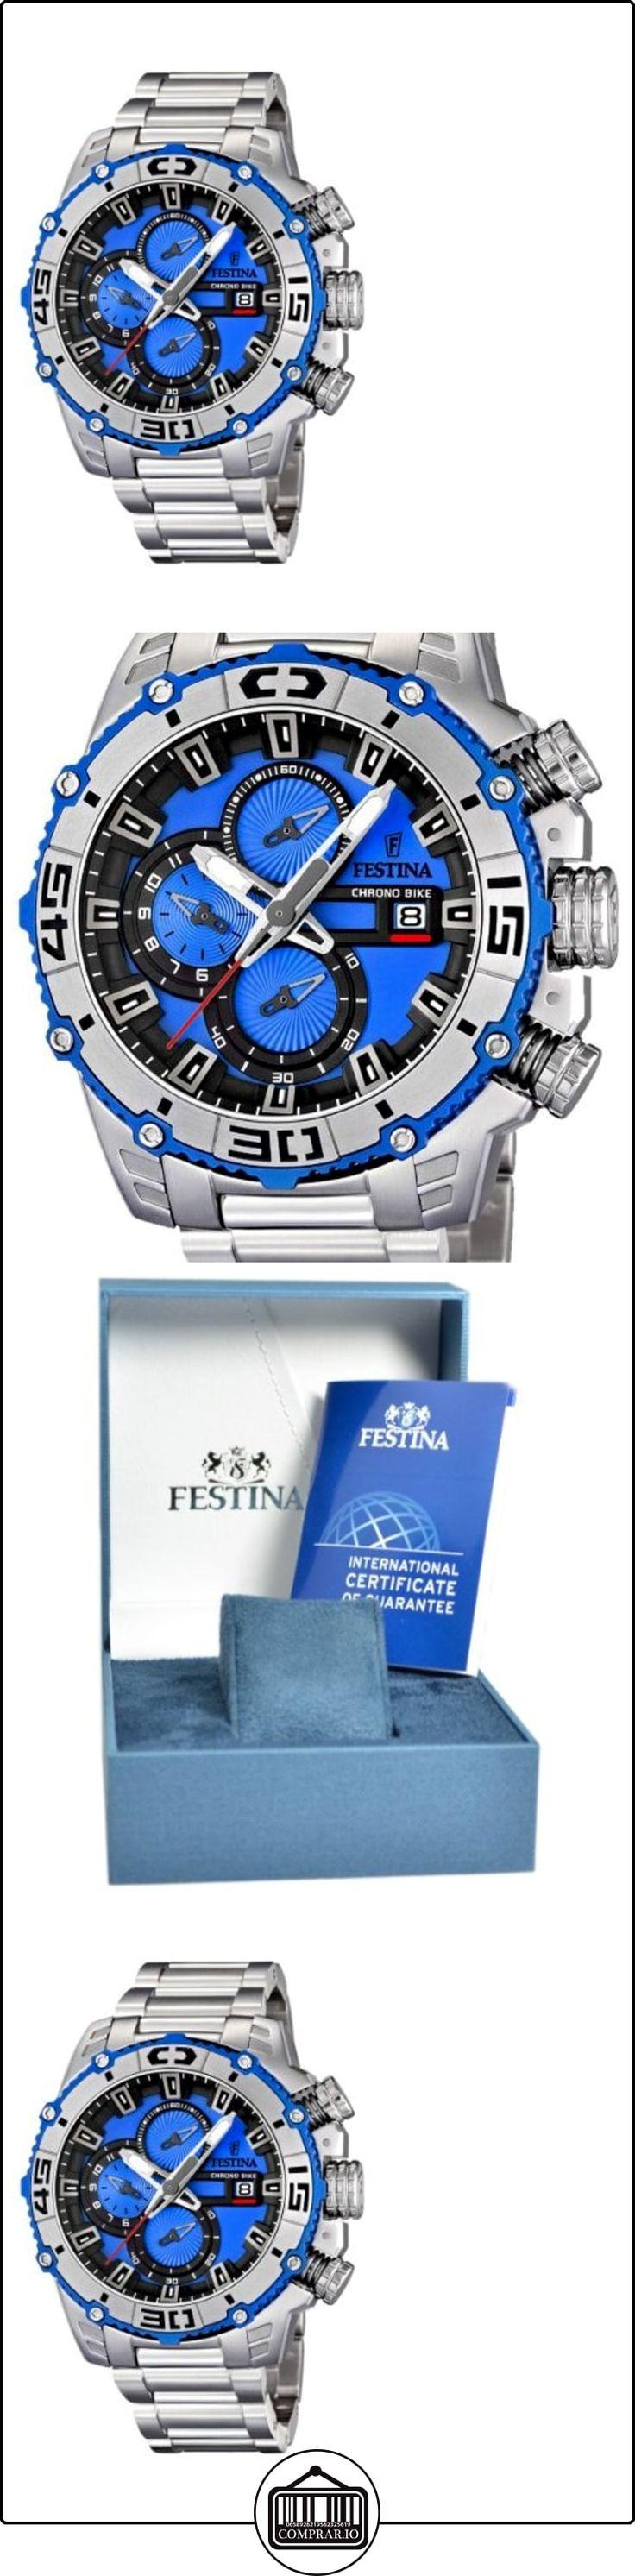 Festina 16599/4 - Reloj cronógrafo de cuarzo para hombre con correa de acero inoxidable, color plateado  ✿ Relojes para hombre - (Gama media/alta) ✿ ▬► Ver oferta: http://comprar.io/goto/B007Z01QEW